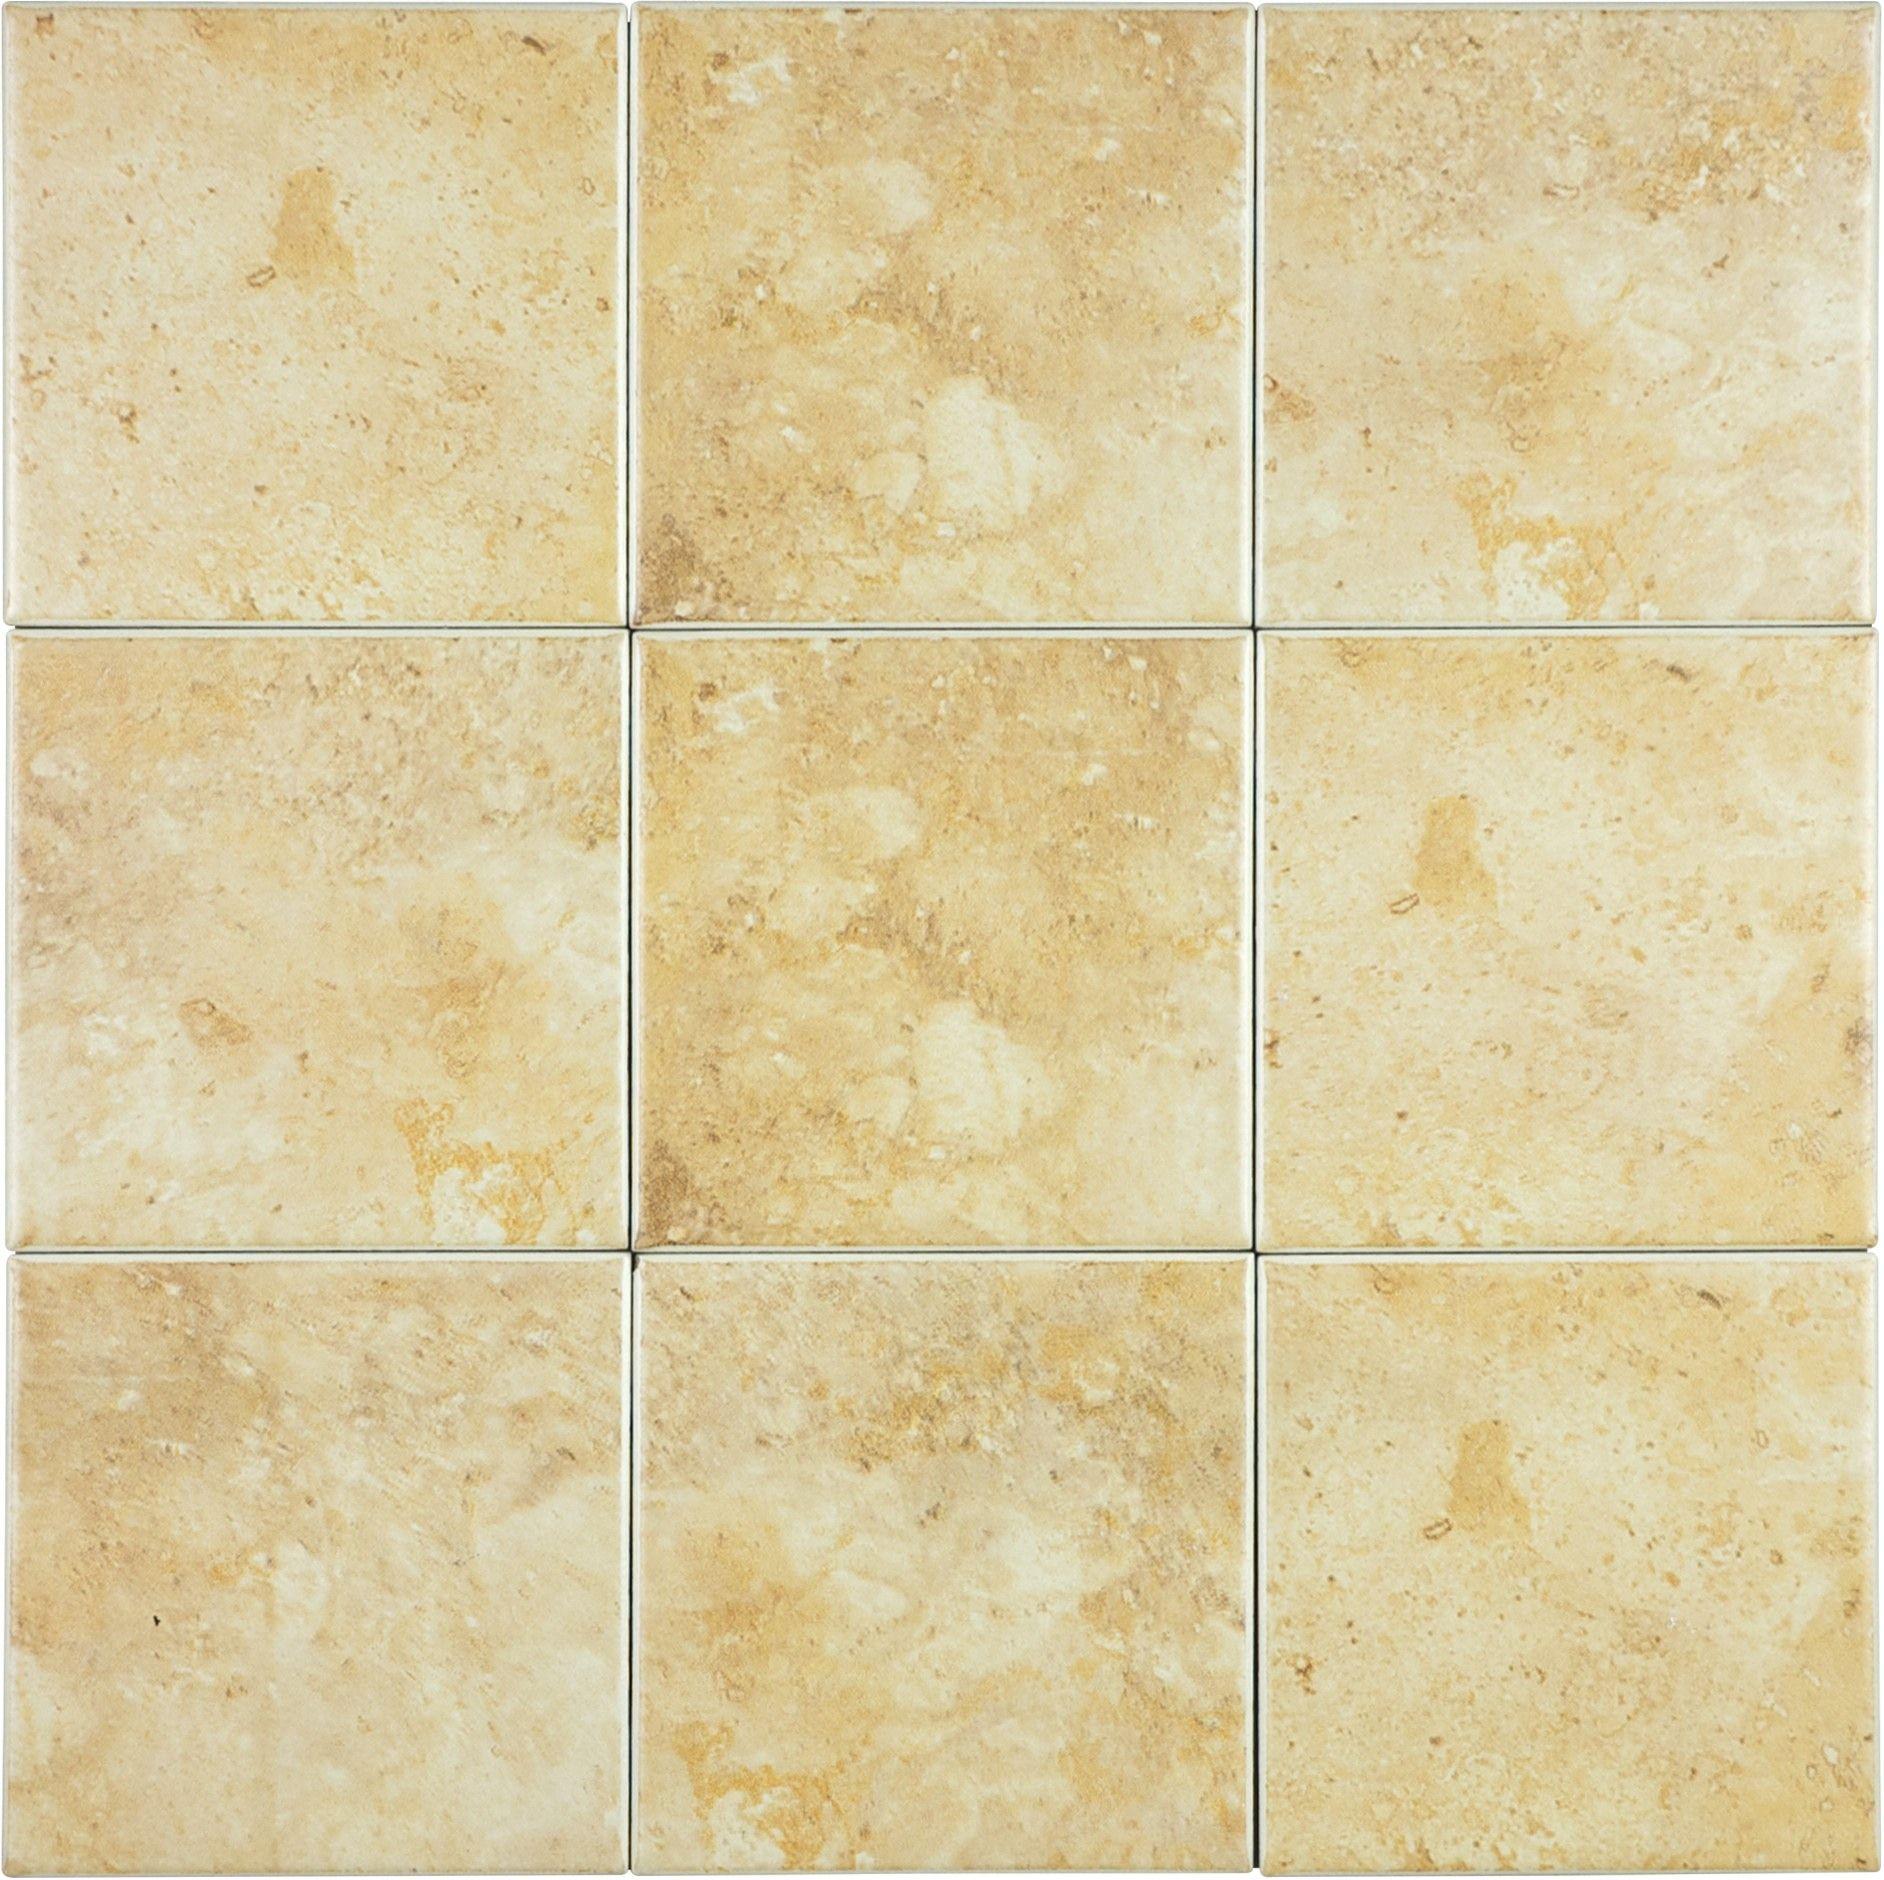 top 28 ceramic tiles clearance london grey clearance grey porcelain kitchen tiles wall. Black Bedroom Furniture Sets. Home Design Ideas